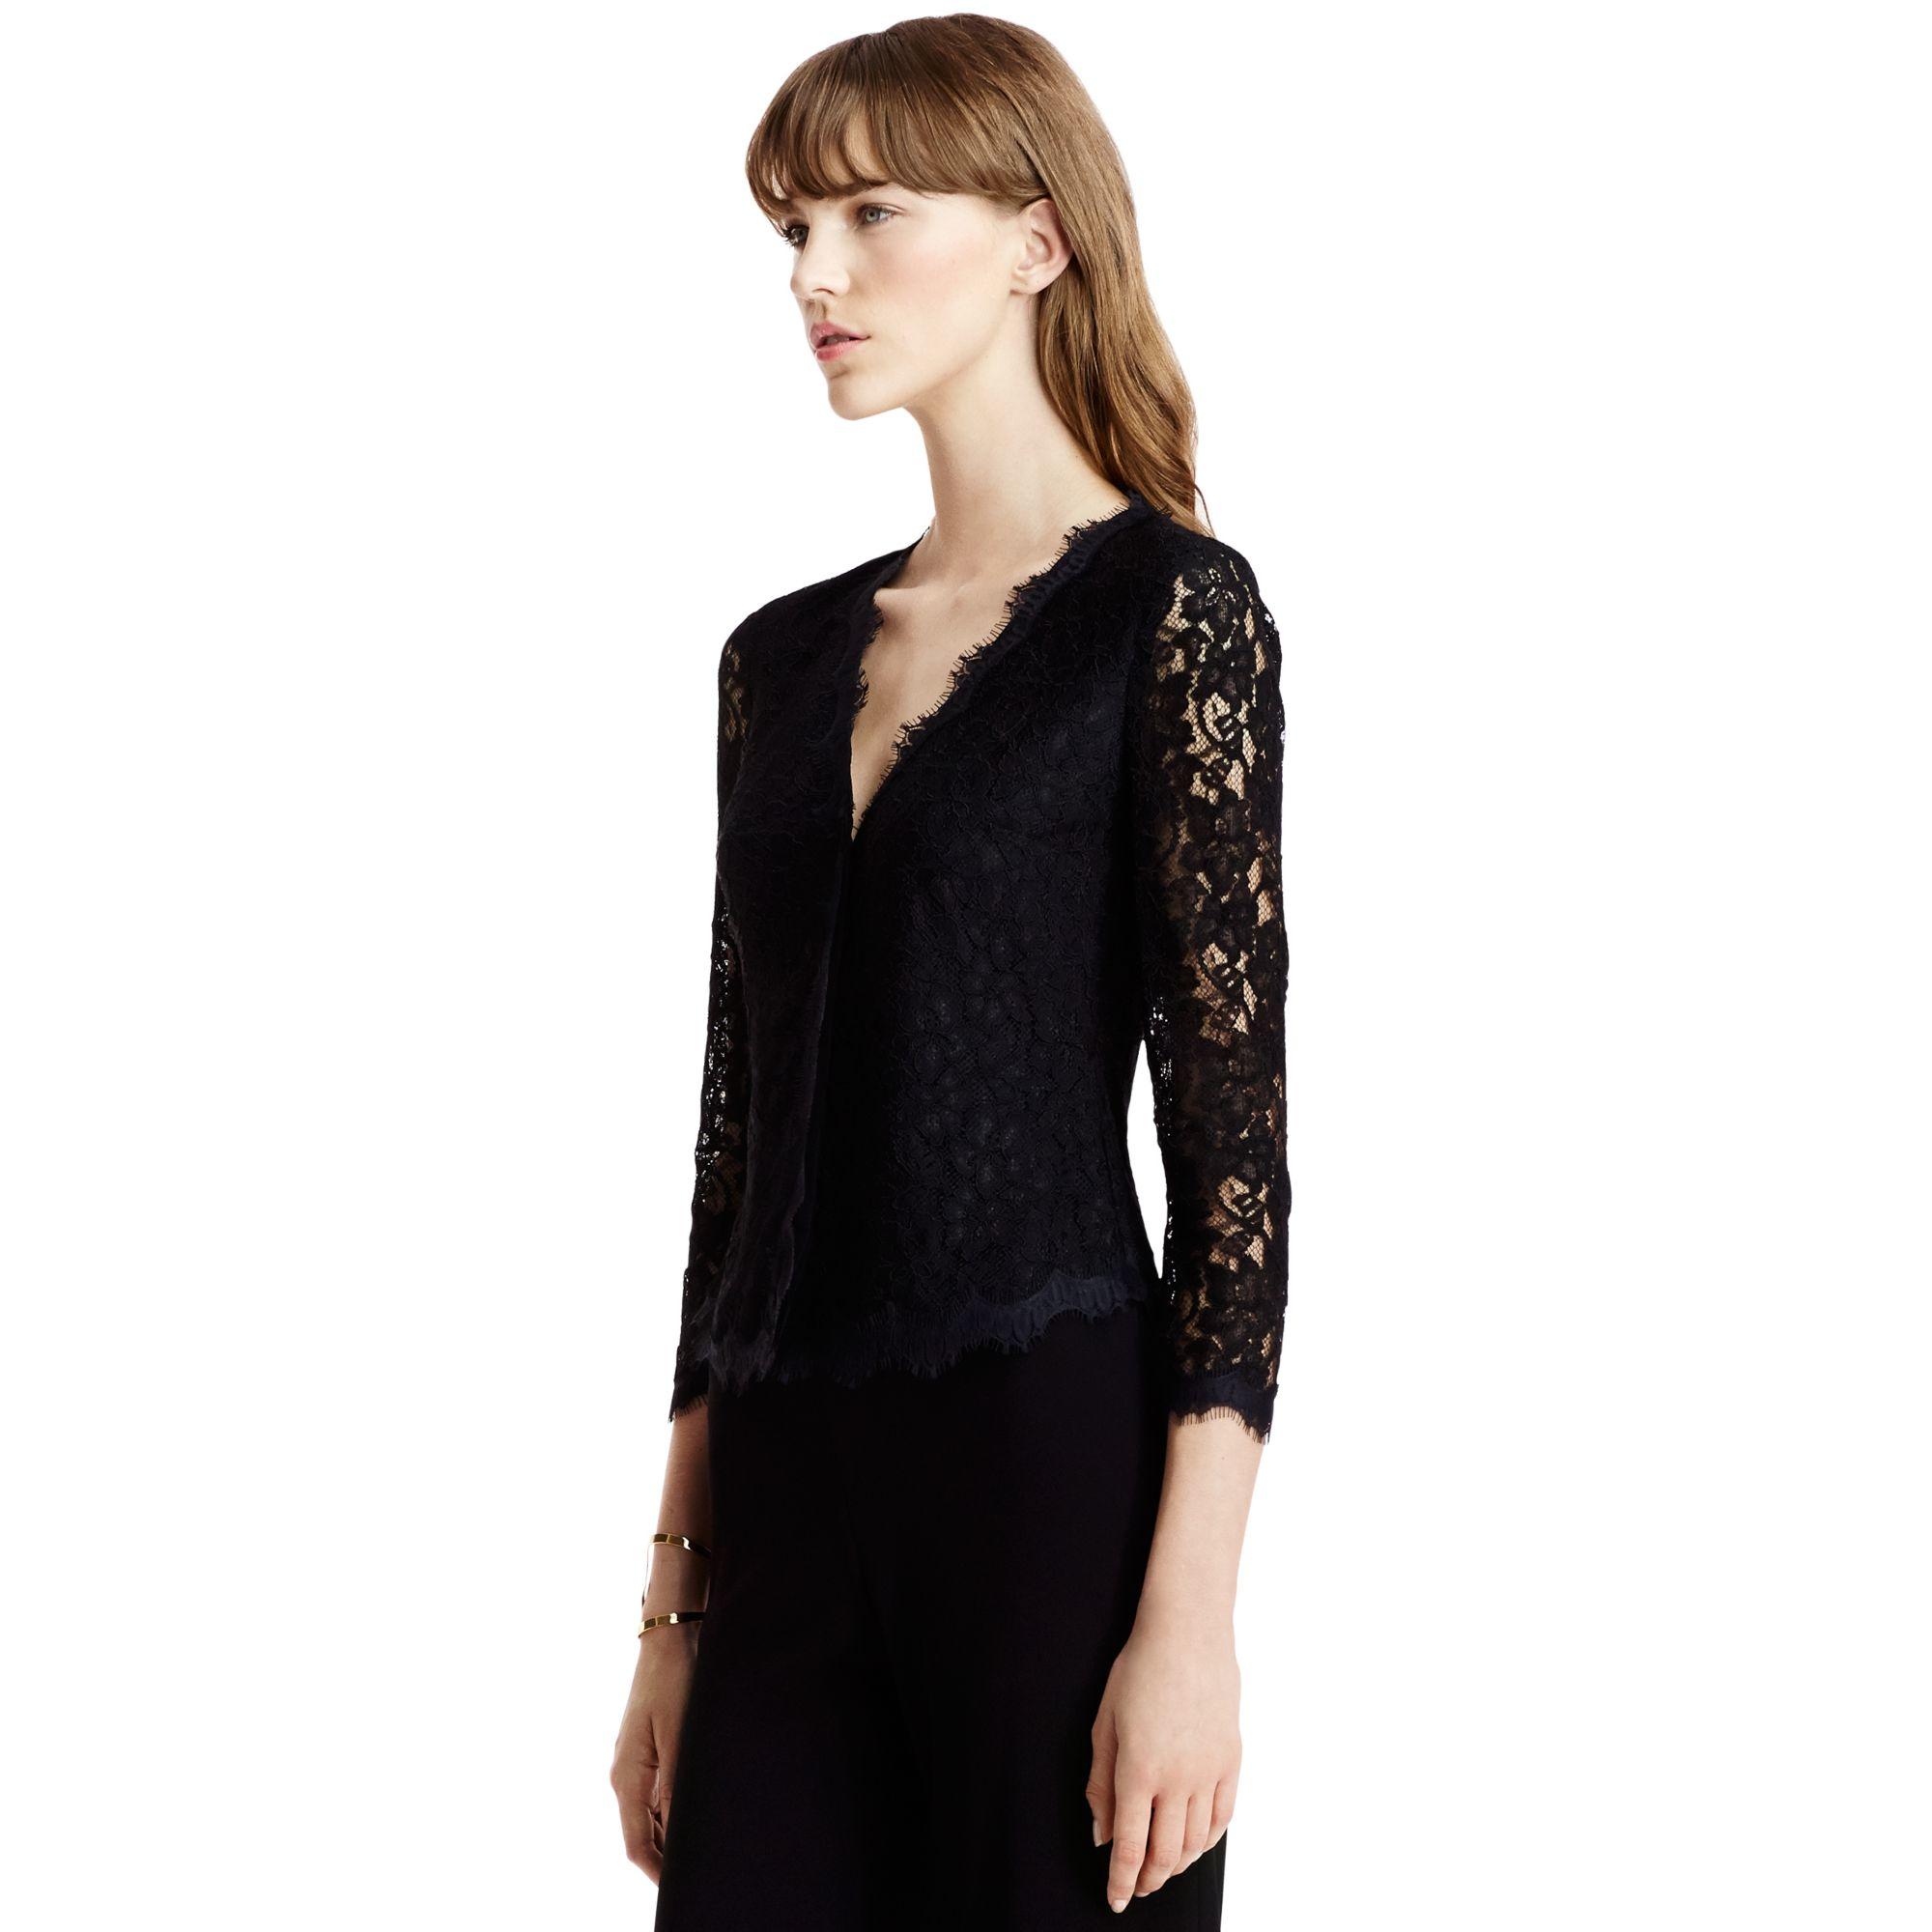 lyst diane von furstenberg dvf bria lace cardigan in black. Black Bedroom Furniture Sets. Home Design Ideas